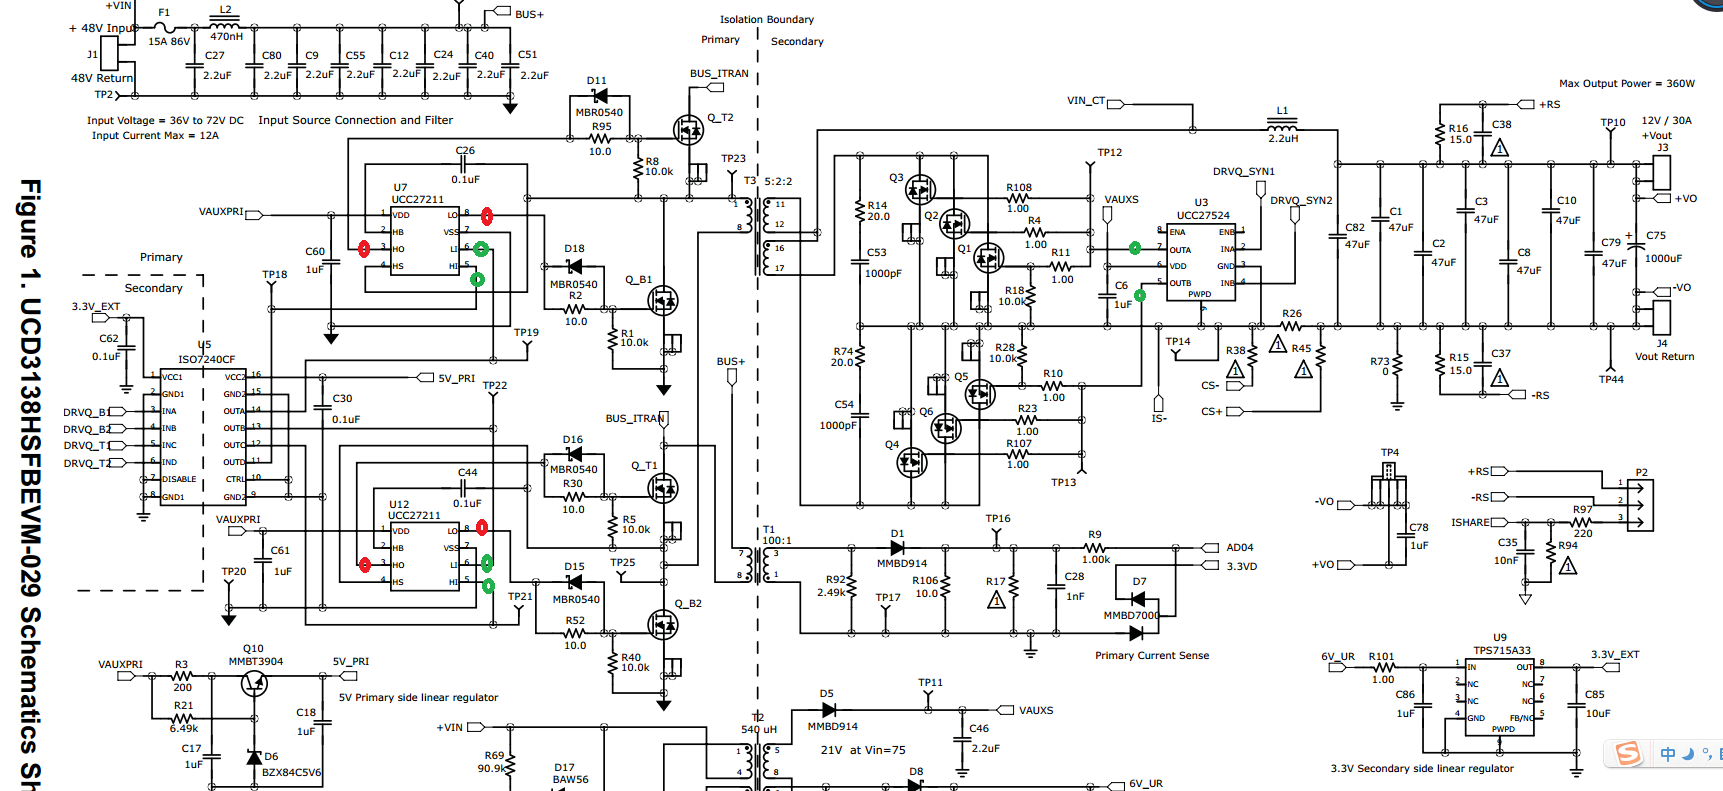 Schematic Diagram Power Supply Schematic Diagram And Complete